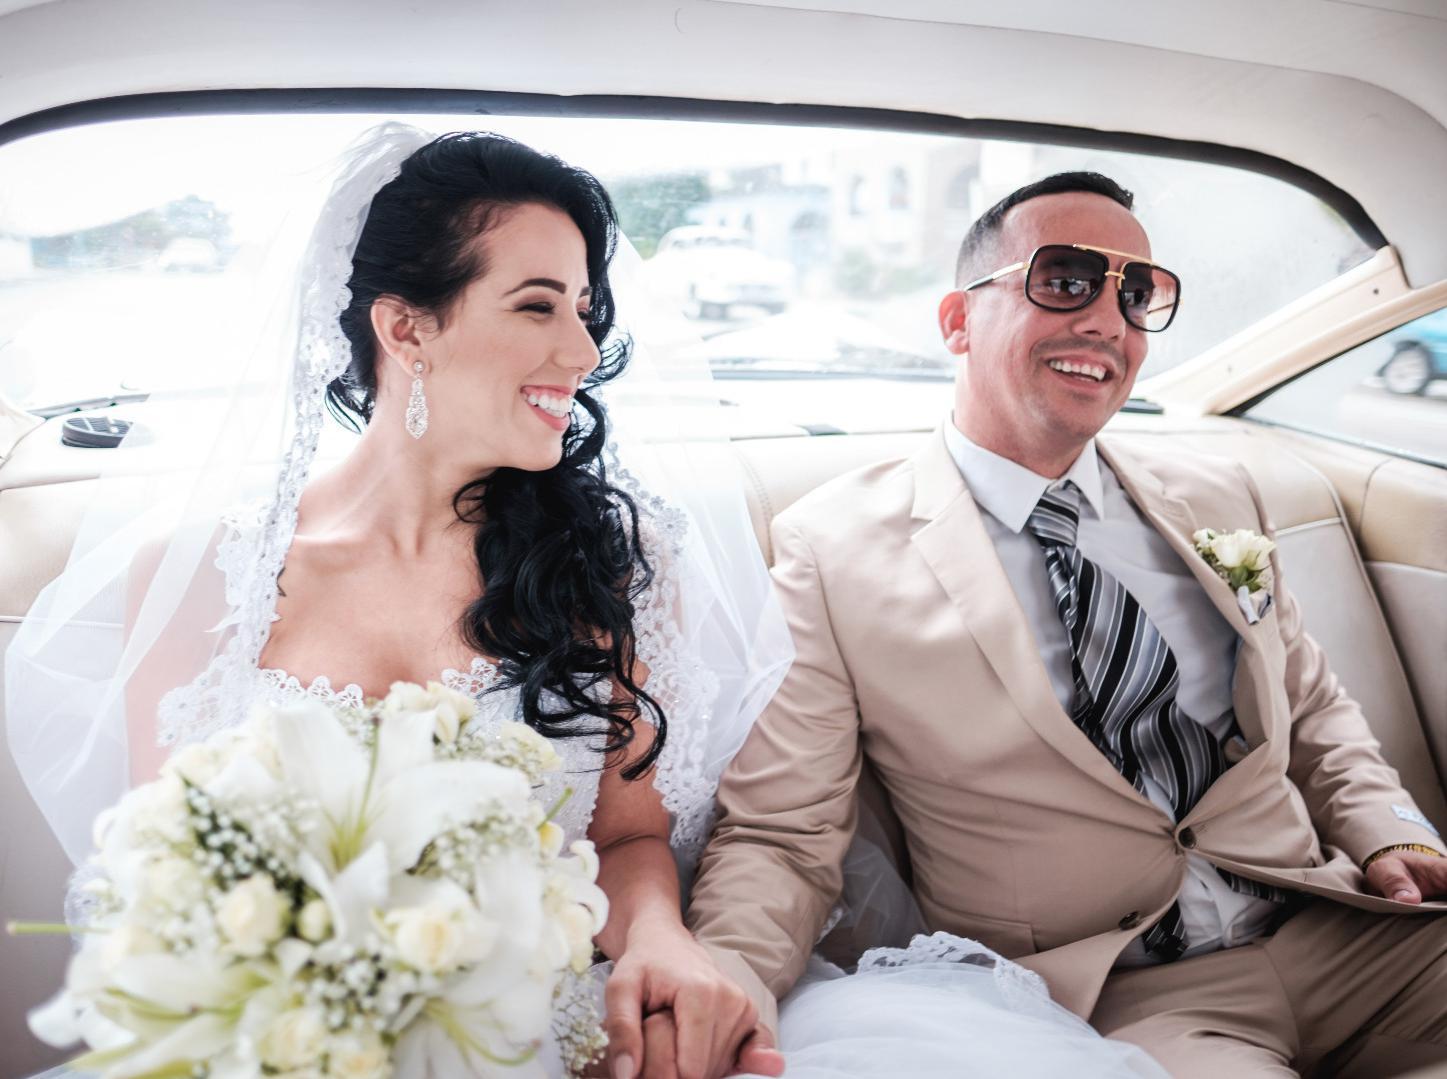 bodas-sin-clasificar-sin-tema-cuba-35422.jpg